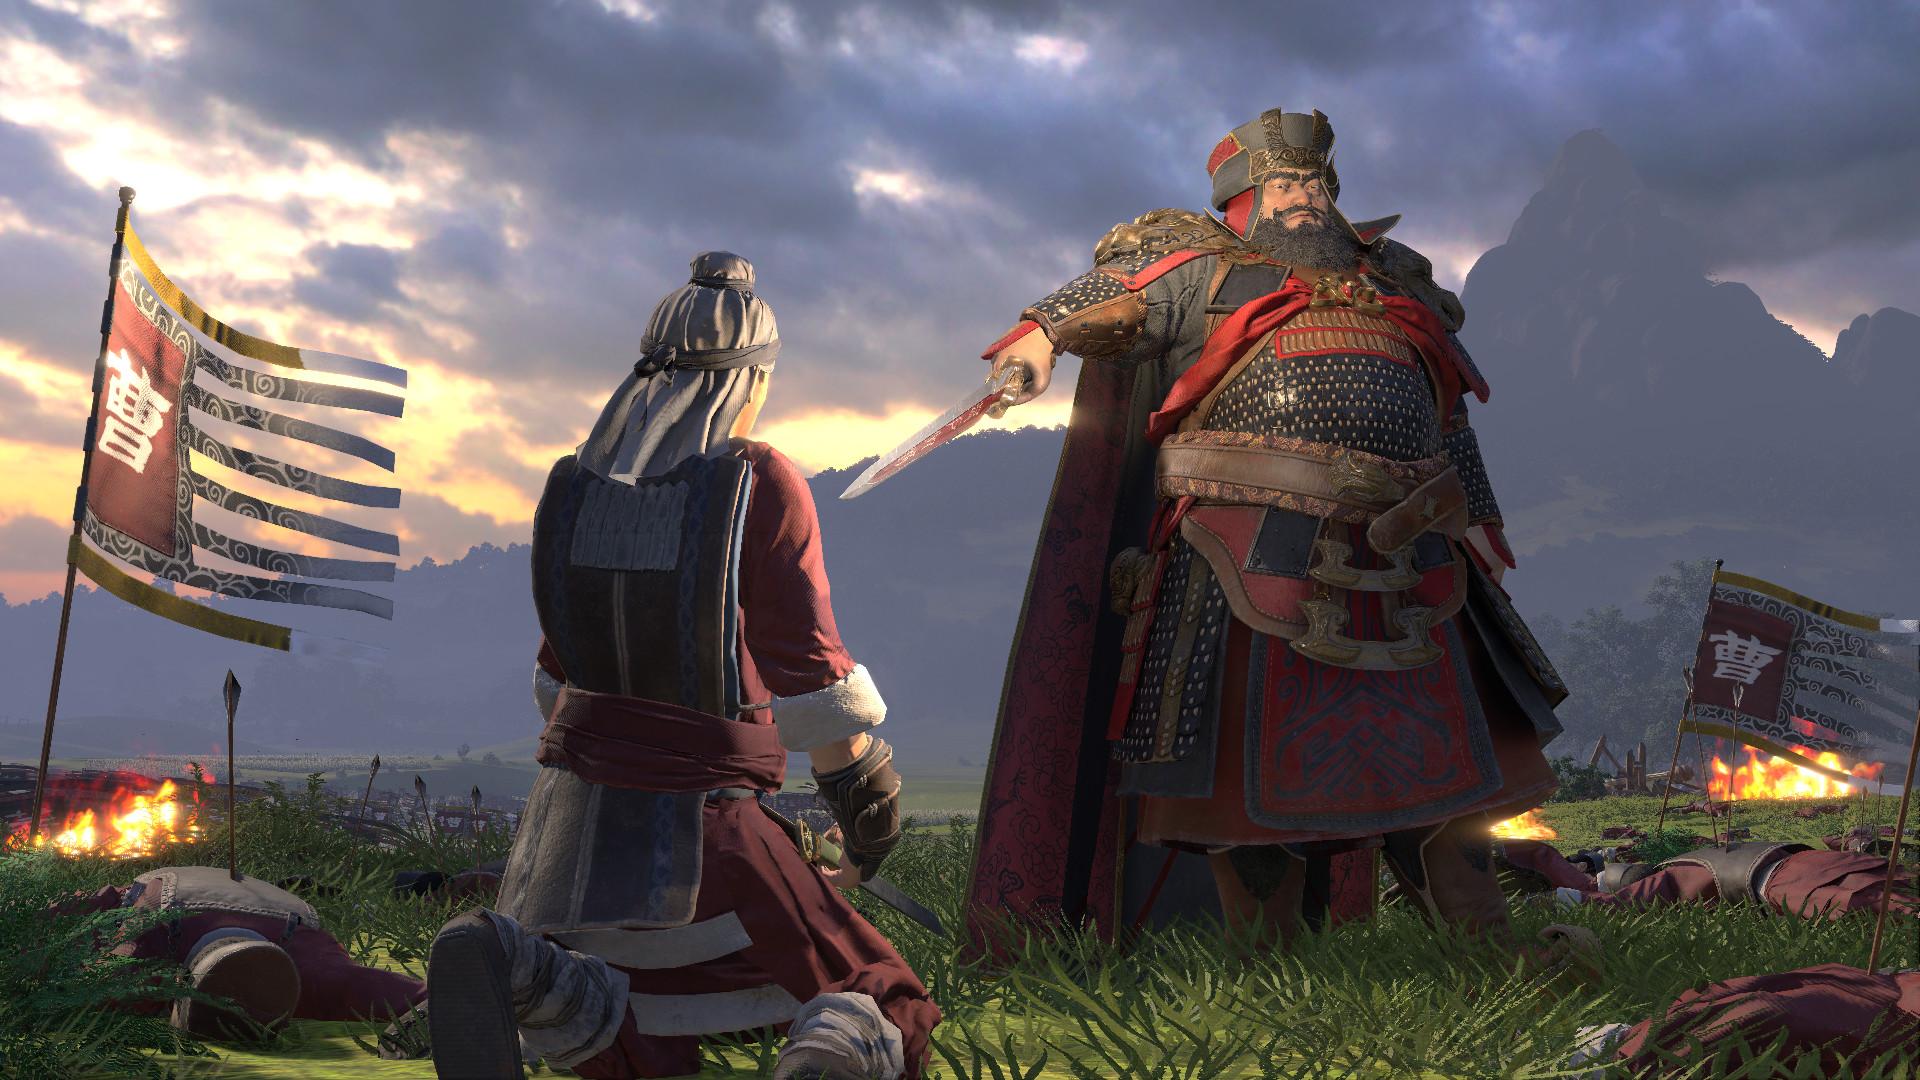 Total War: Three Kingdoms shows off its most villainous leader | PC